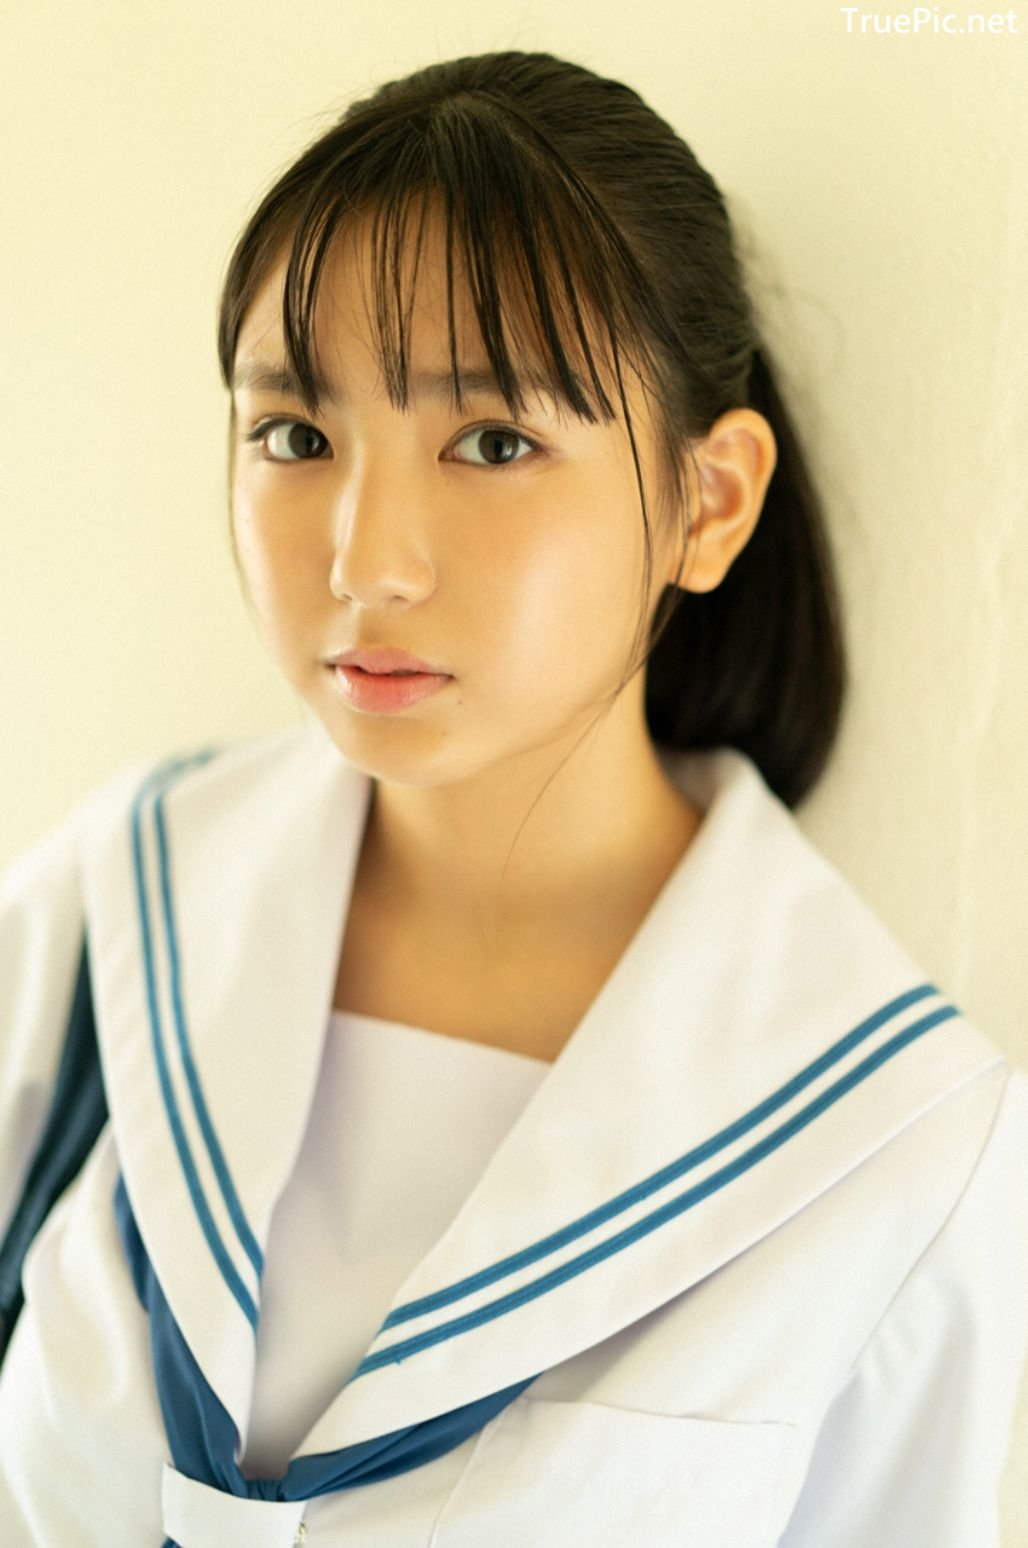 Image-Japanese-Pop-Idol-Aika-Sawaguchi-Champion-Road-TruePic.net- Picture-5